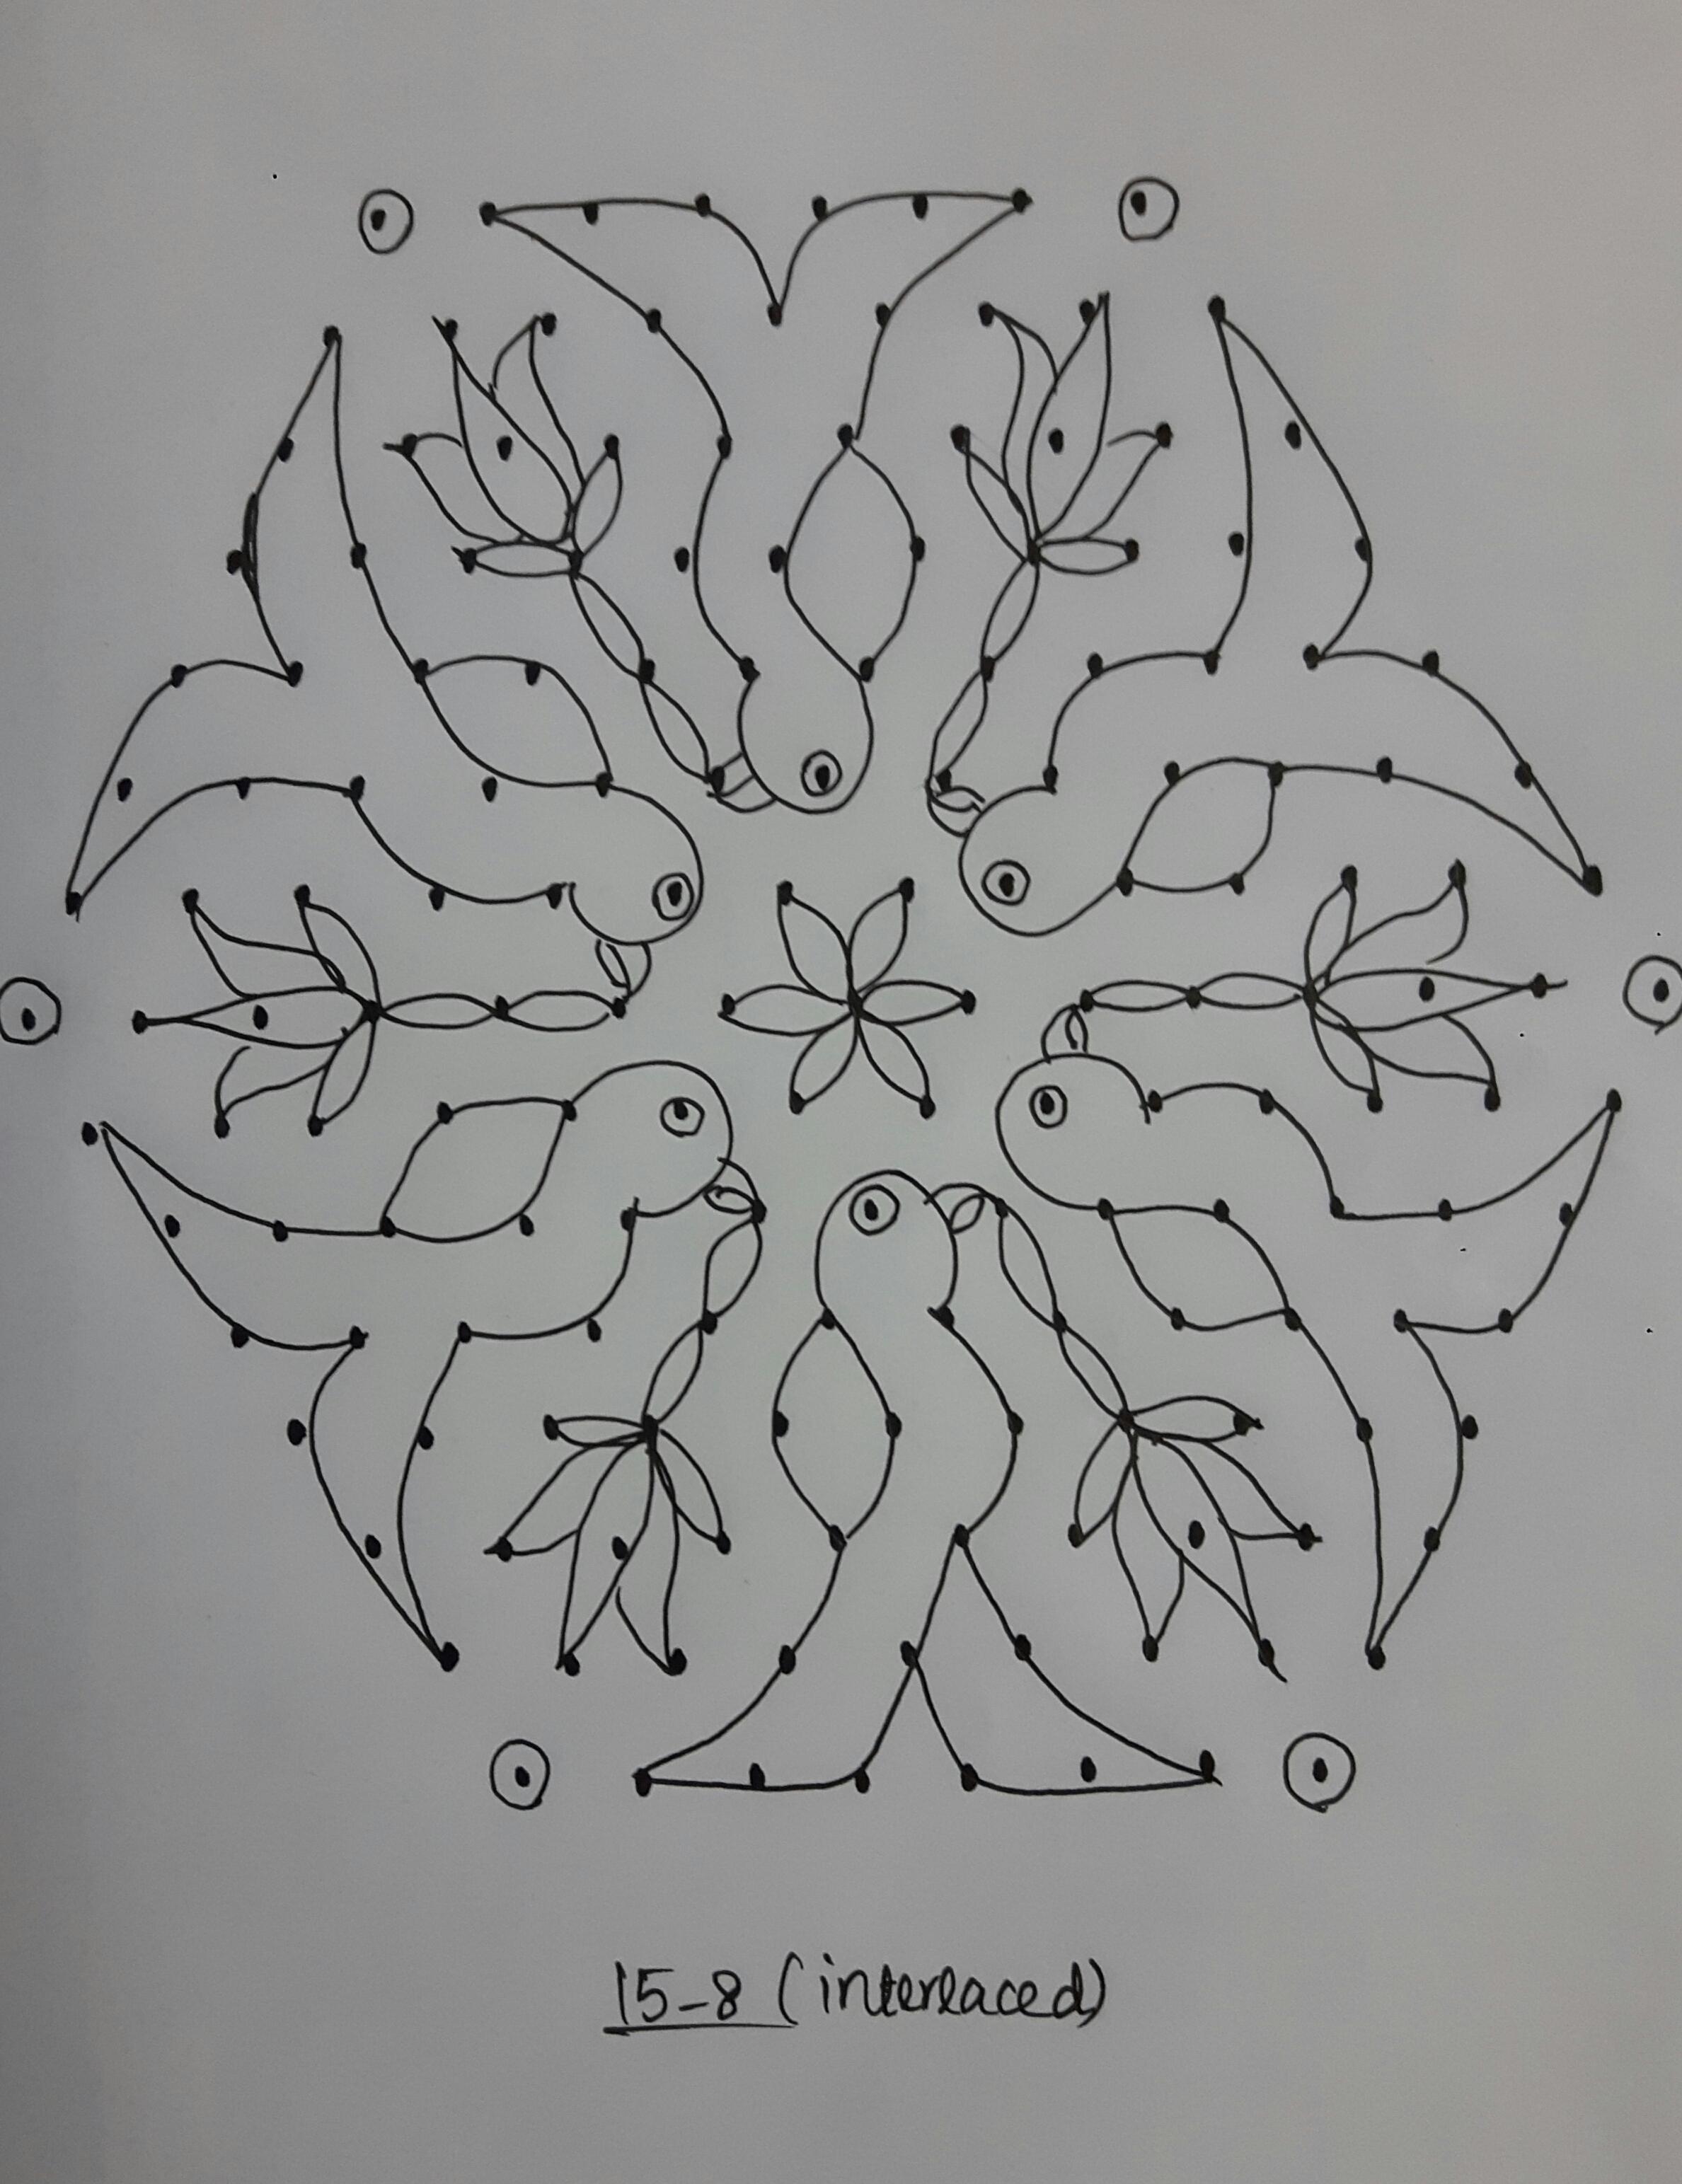 Parrot kolam in 15 dots || Contest Kolam